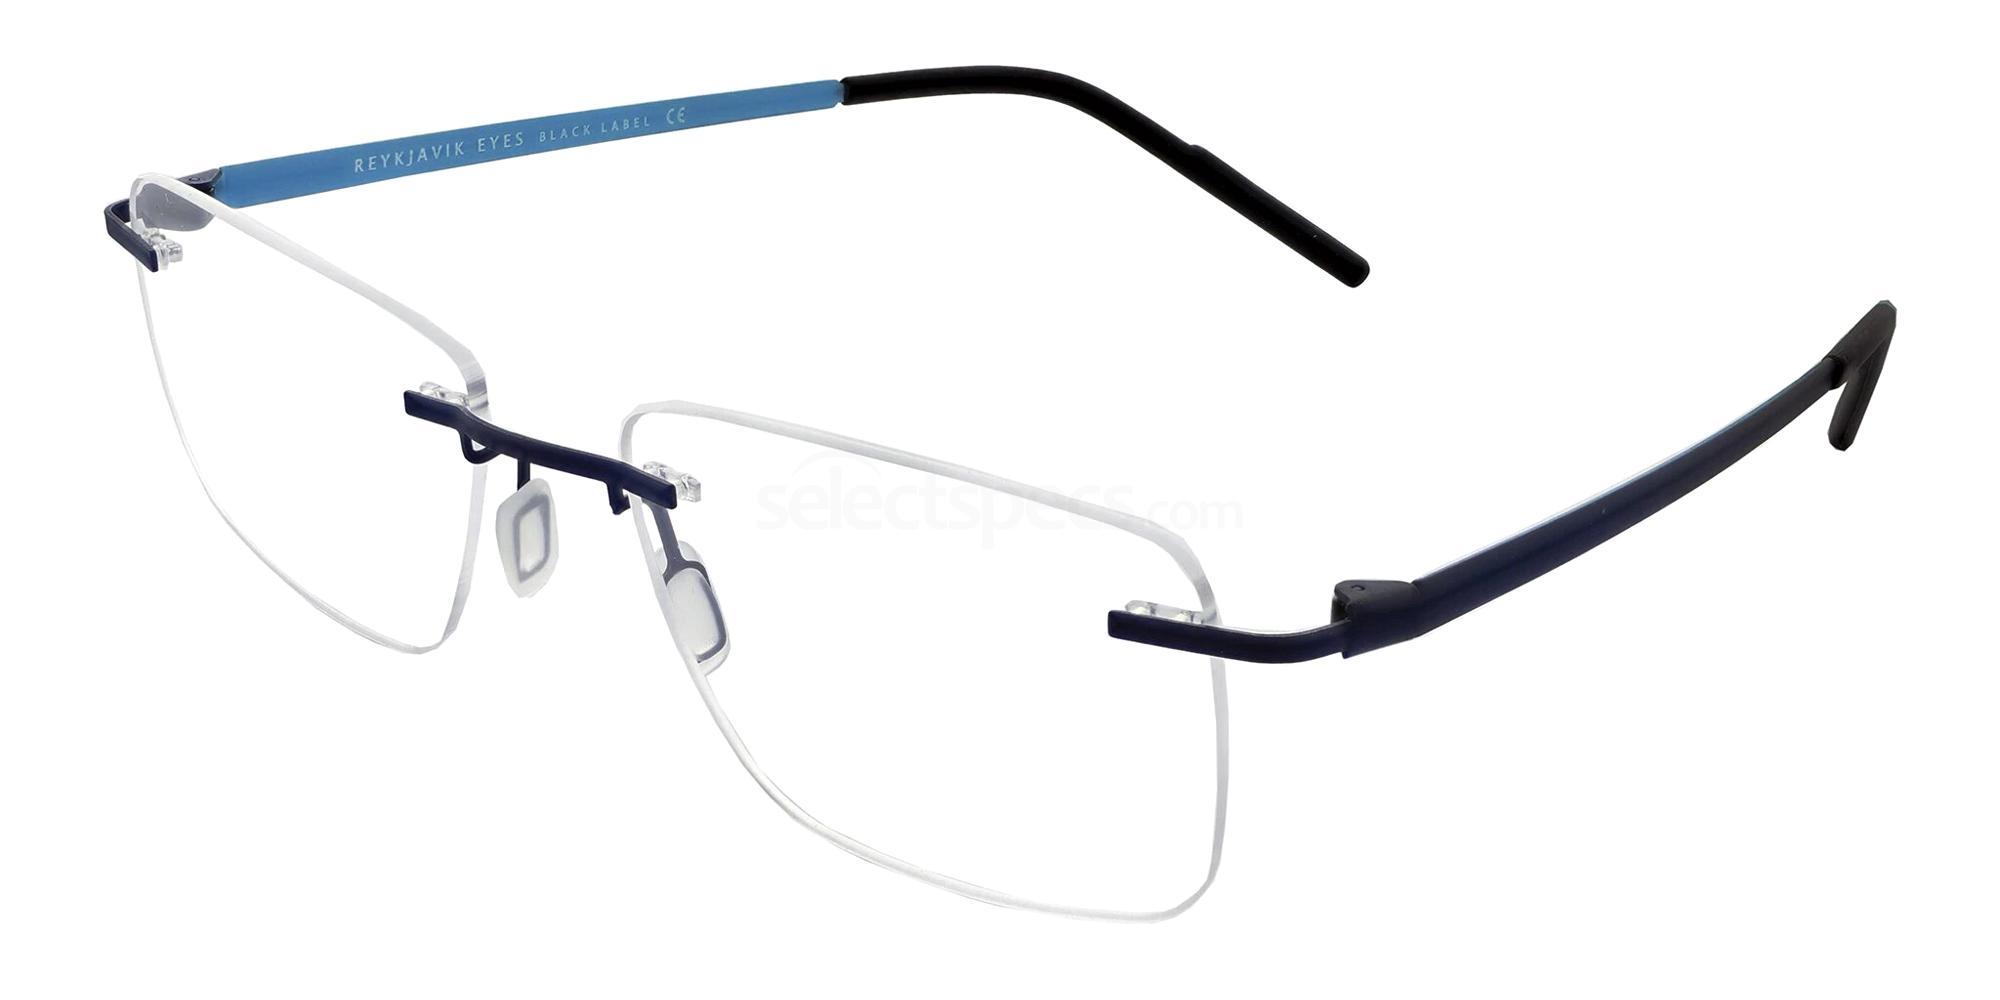 C1 ERON Glasses, Reykjavik Eyes Black Label